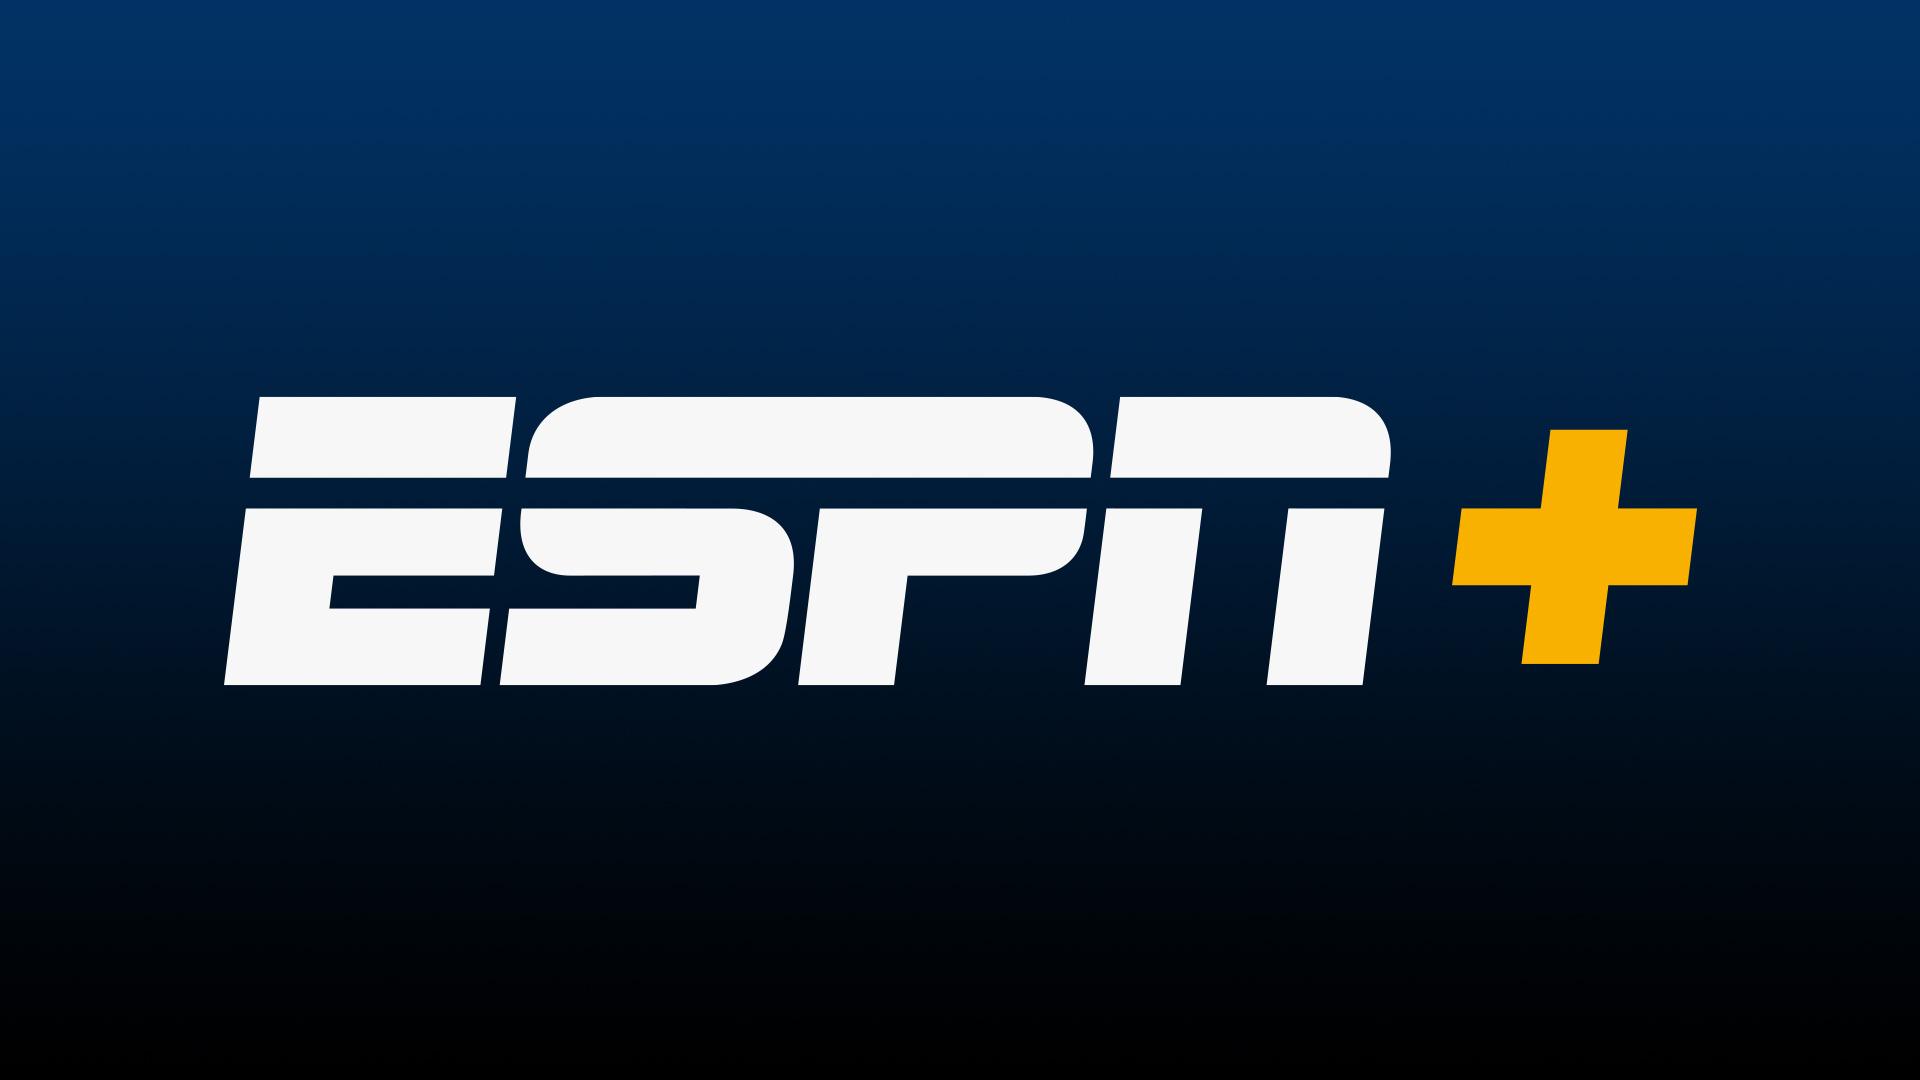 Live Sports Streaming Original Shows Award Winning Documentaries Espn